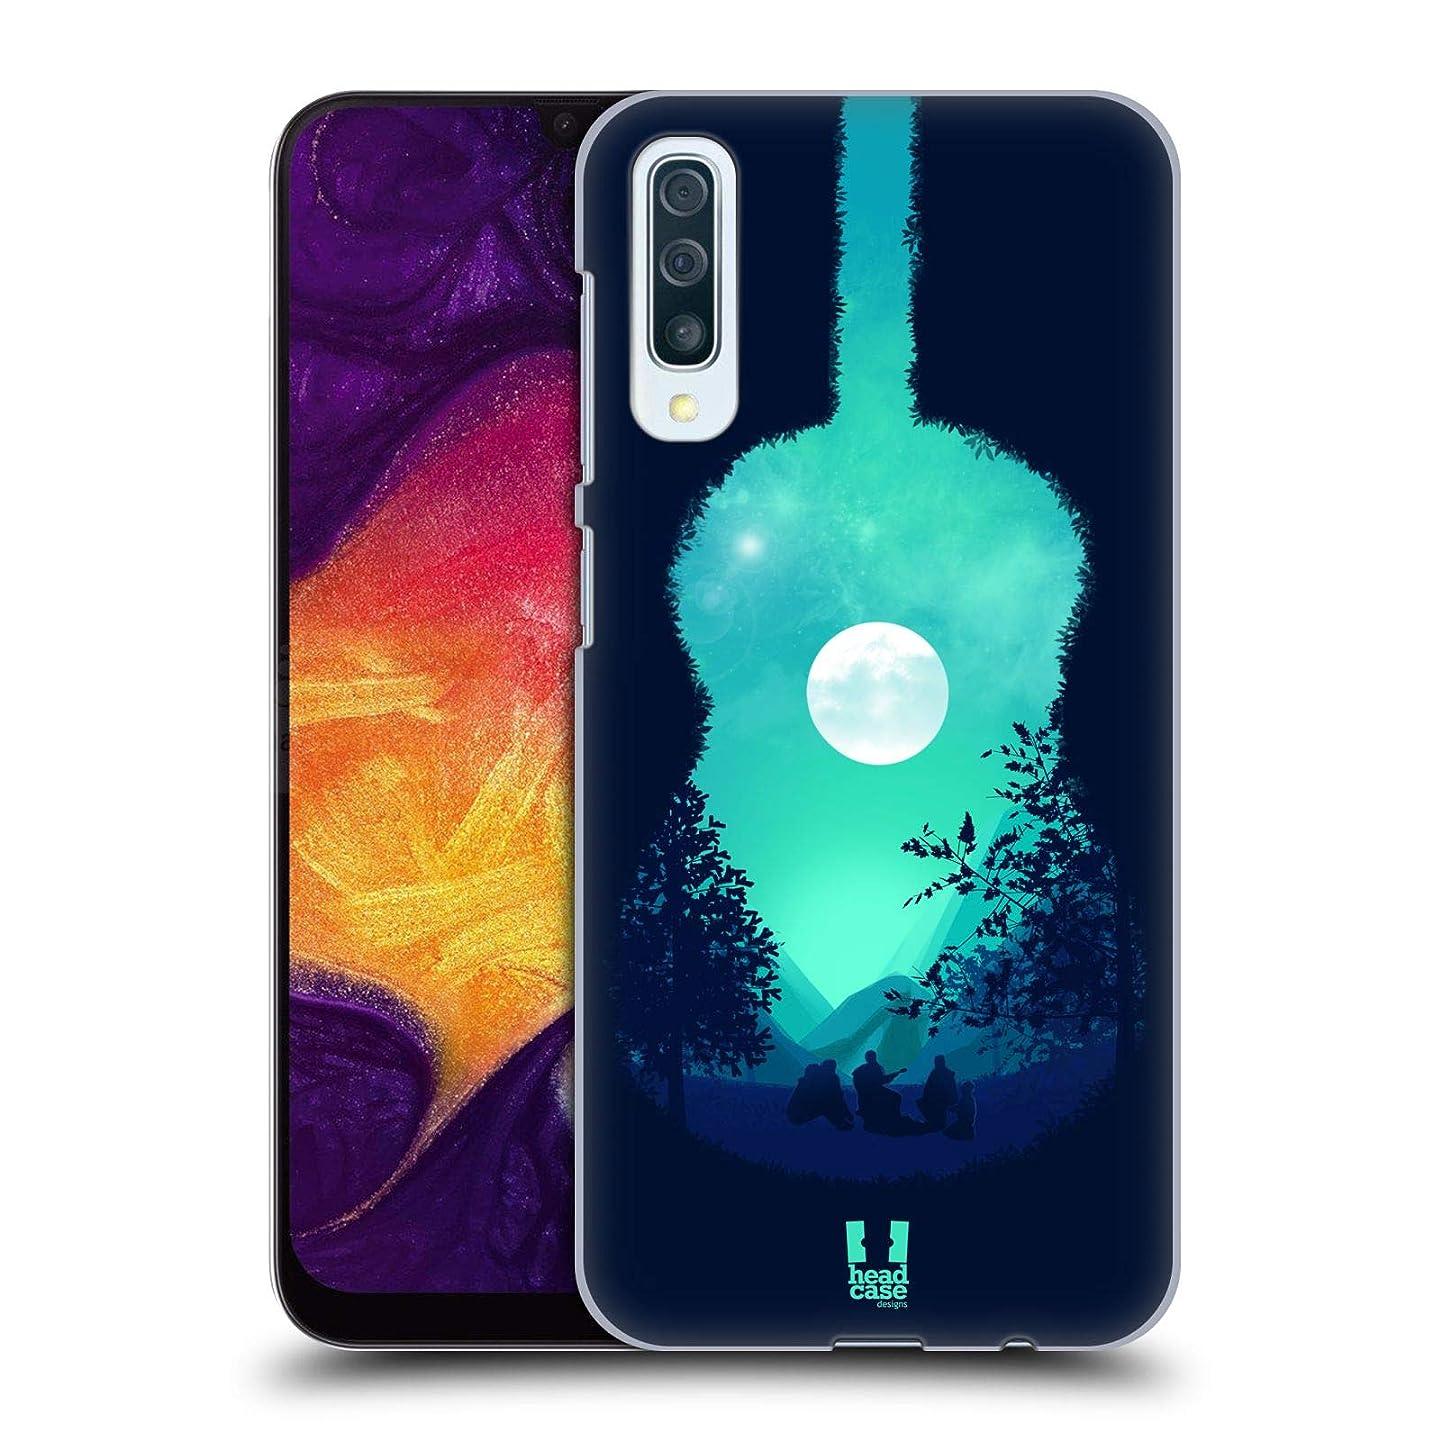 Head Case Designs Guitar Summer Memories Hard Back Case Compatible for Samsung Galaxy A50 (2019)